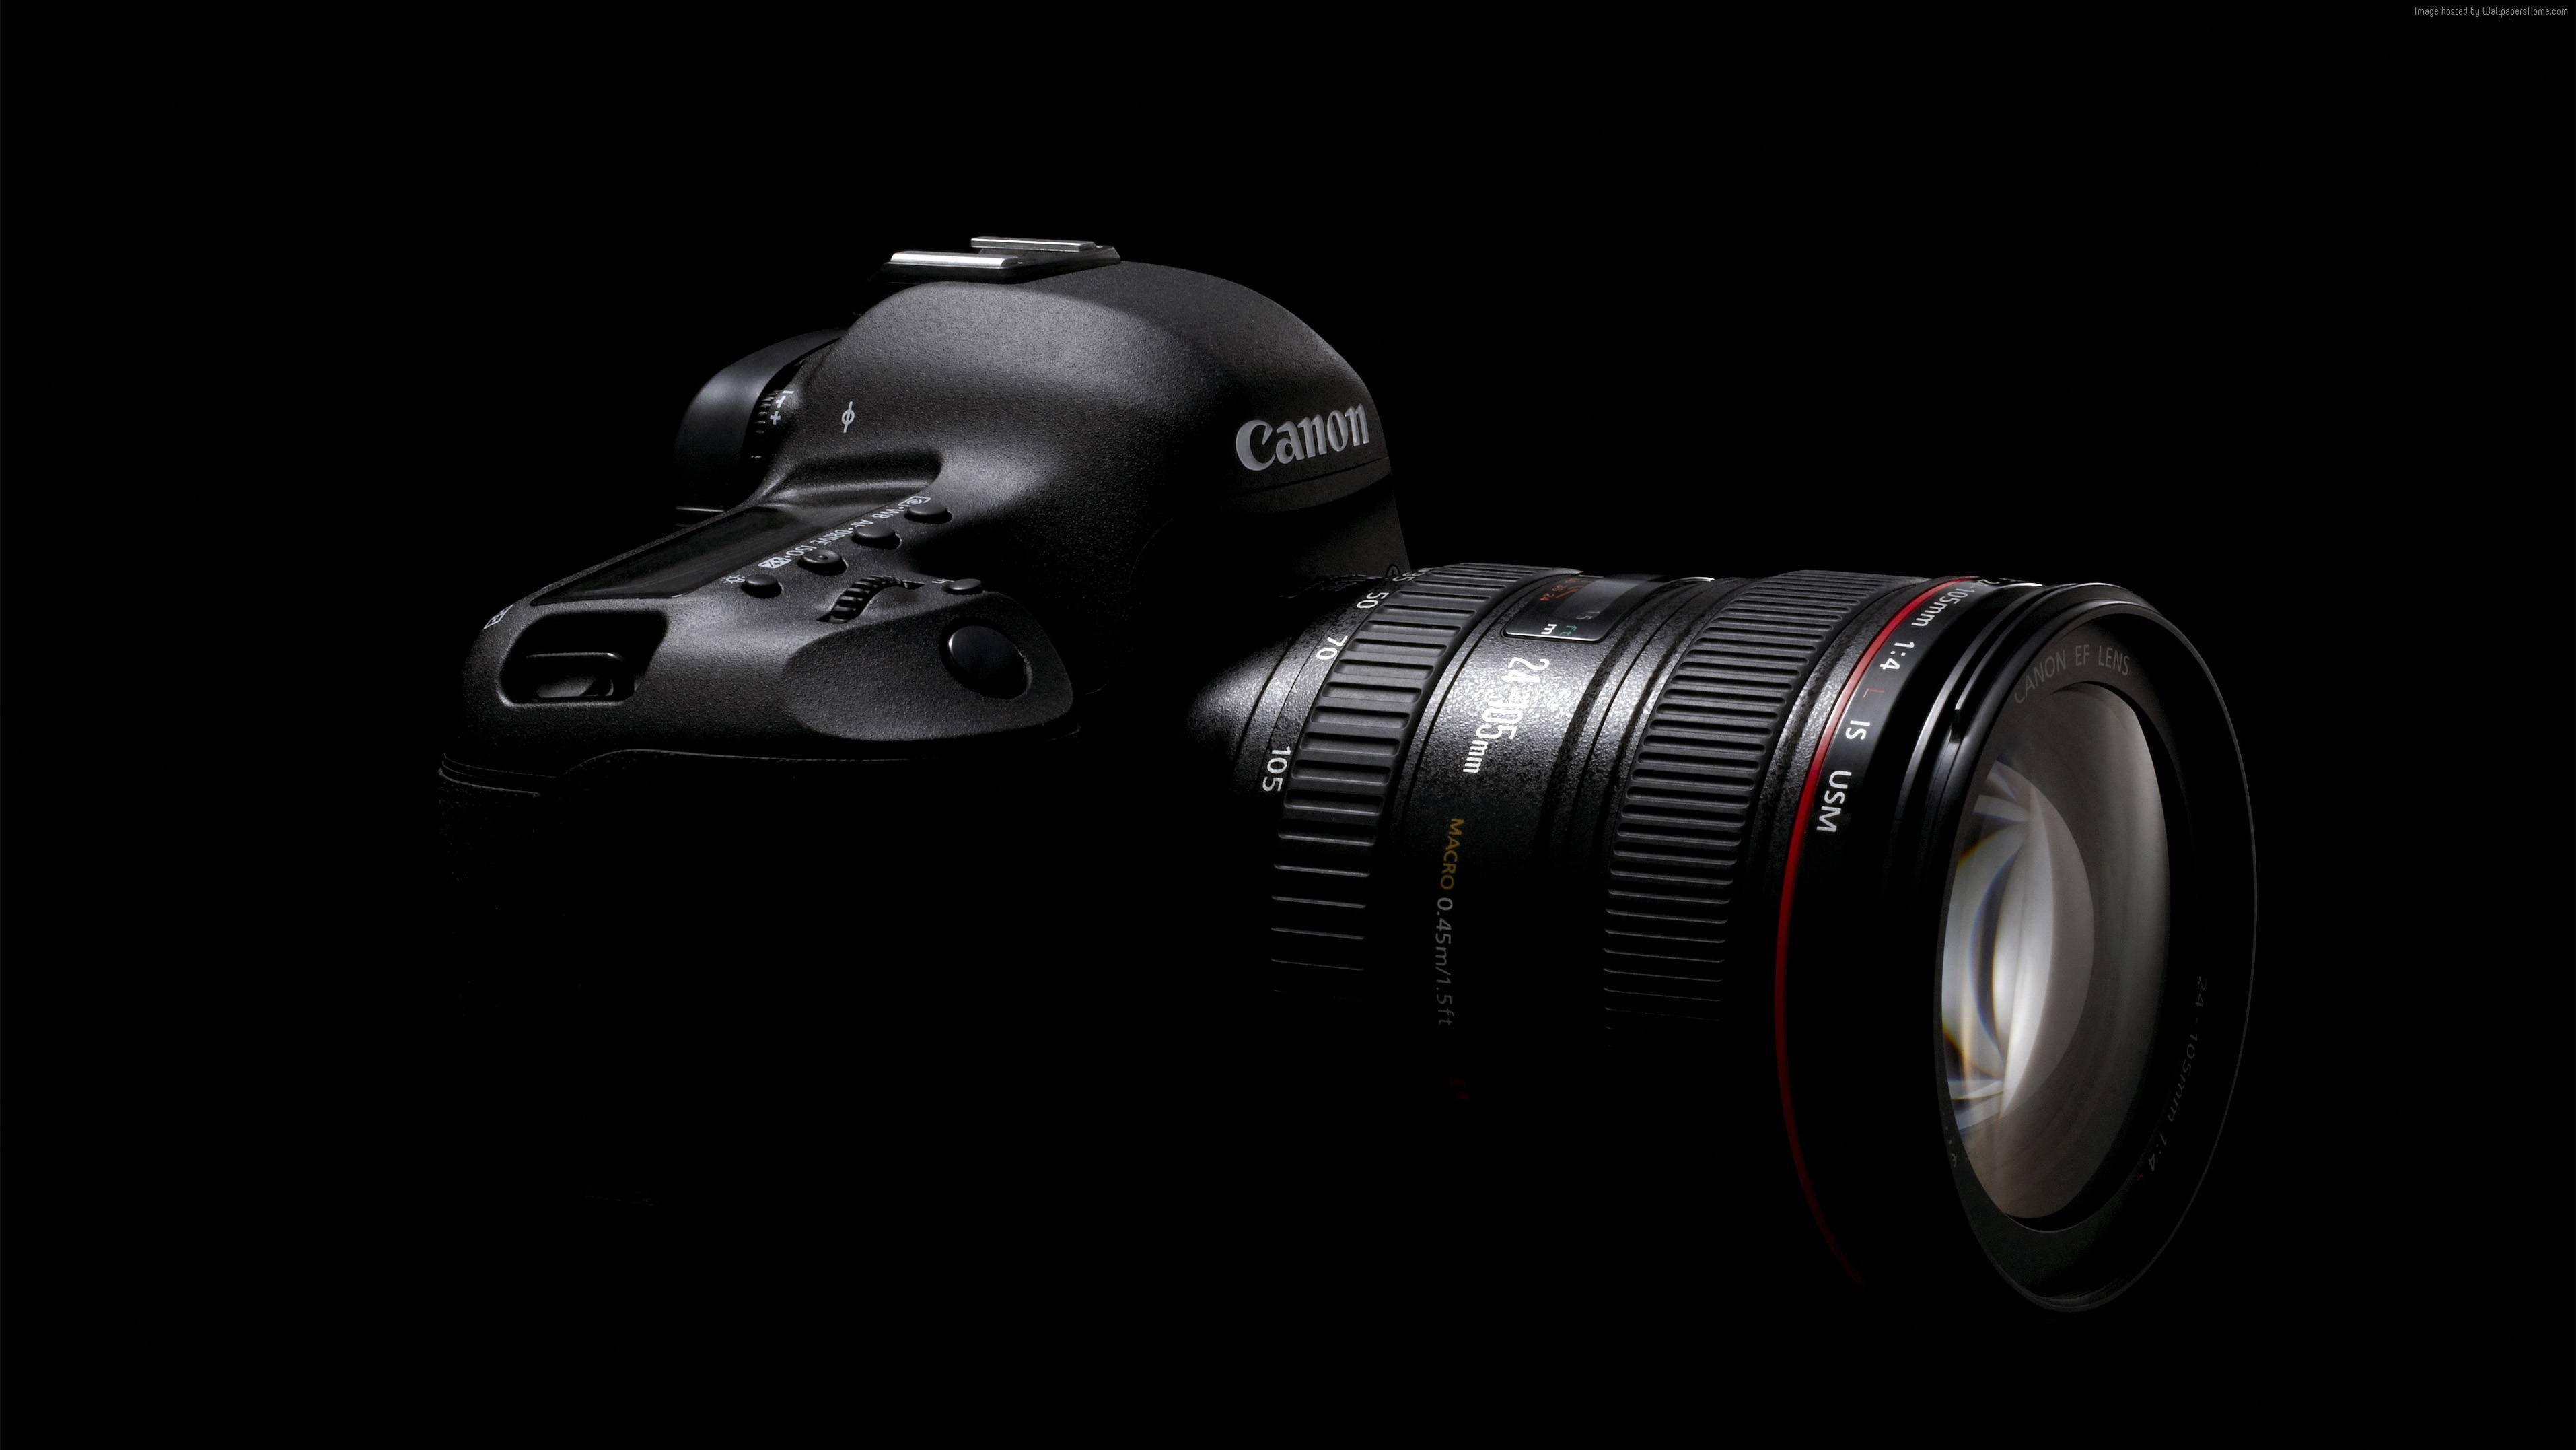 41 Best Free Canon 5d Mark Iii 2560x1440 Wallpapers Wallpaperaccess